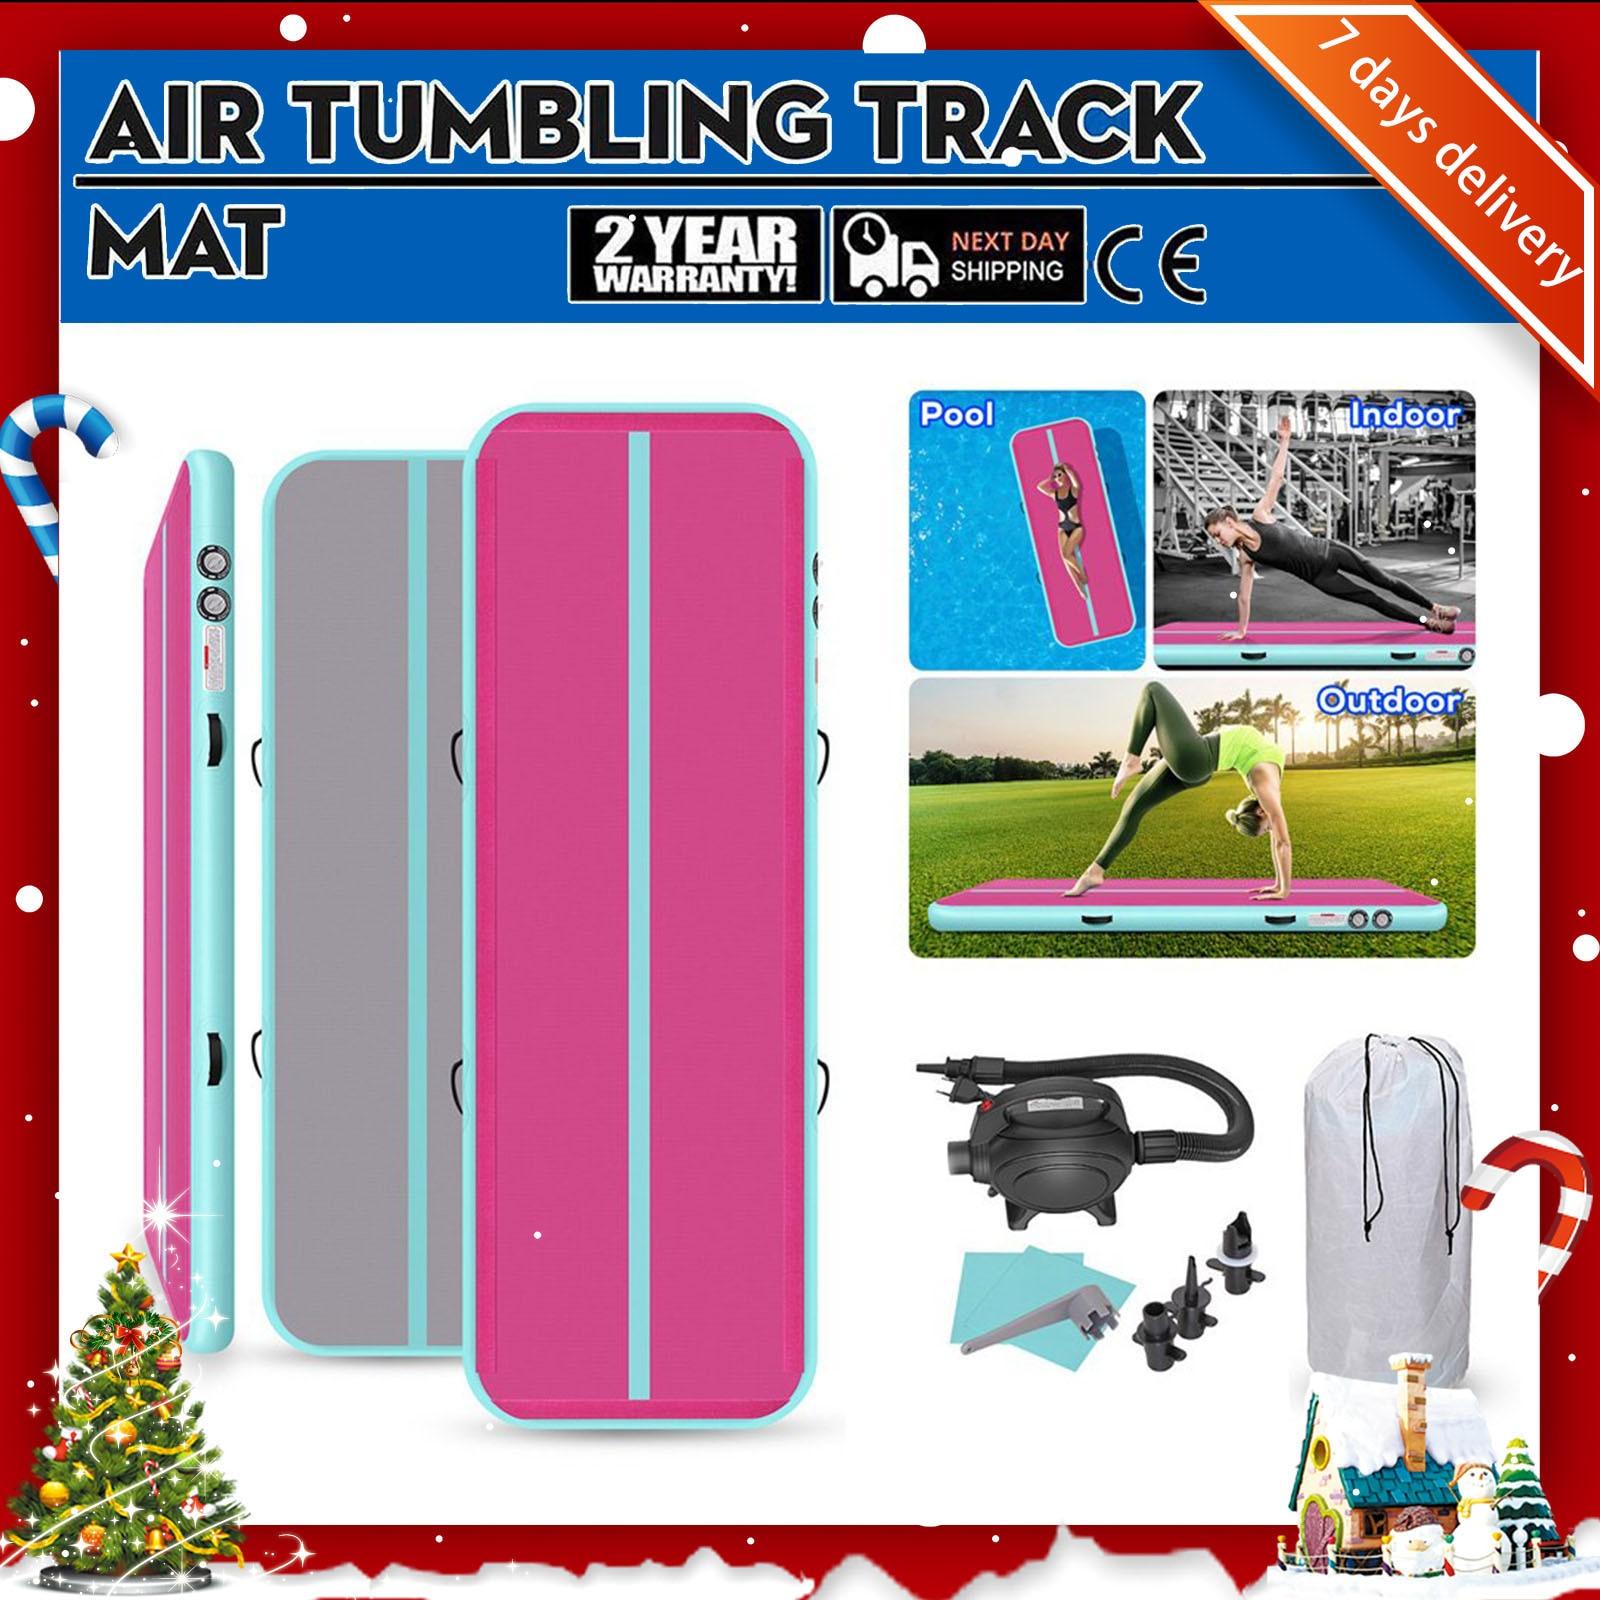 Rimdoc 4/5/6M Tumbling Air Track Floor Airtrack Inflatable Training/Cheerleading/Beach Olympics Gym Mat For Kids Birthday Gift